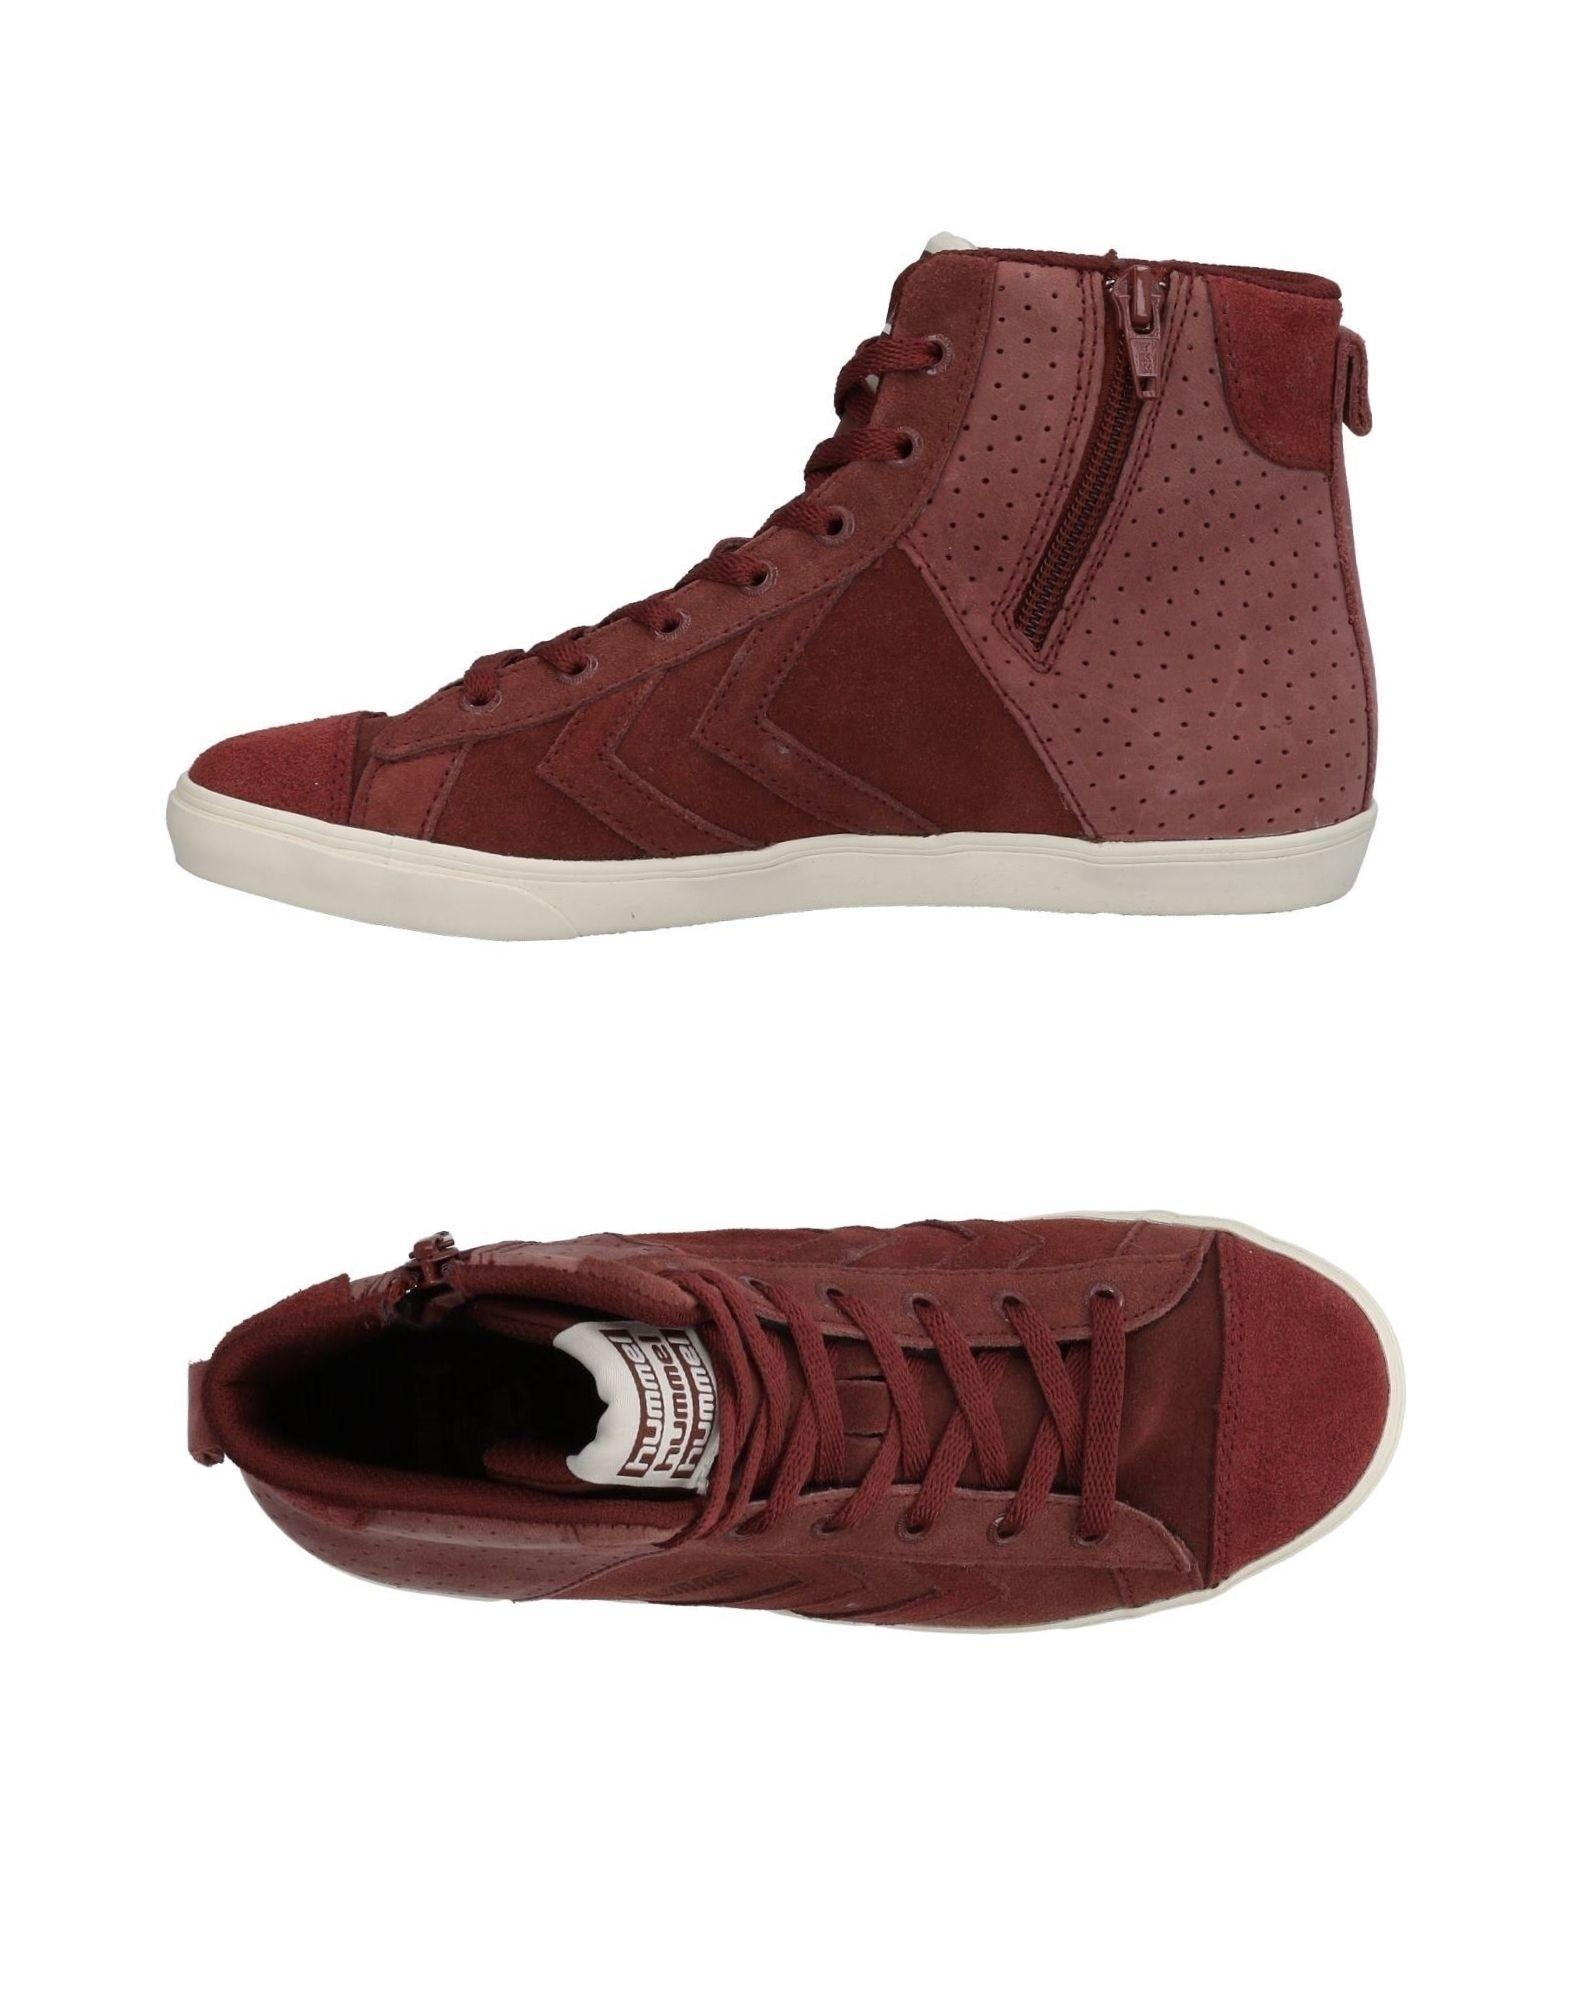 A buon mercato Sneakers Hummel Donna - 11415707FE